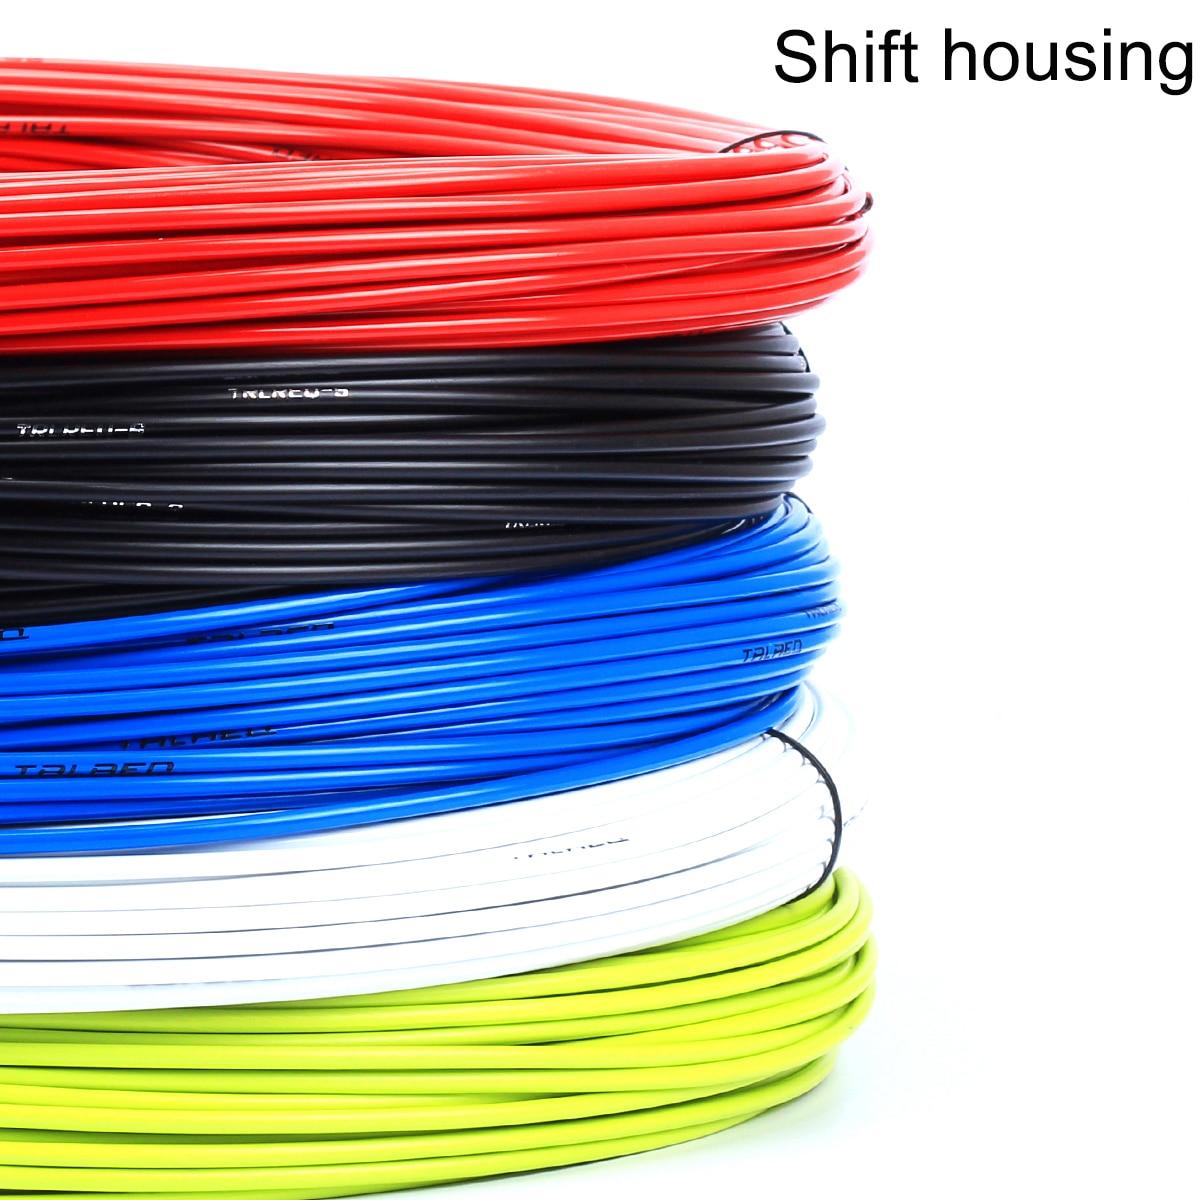 3 metros vivienda de cambio/shifter cable exterior vivienda para carretera MTB bicicleta forrado Shift cable carcasa Kit de manguera set para Shimano